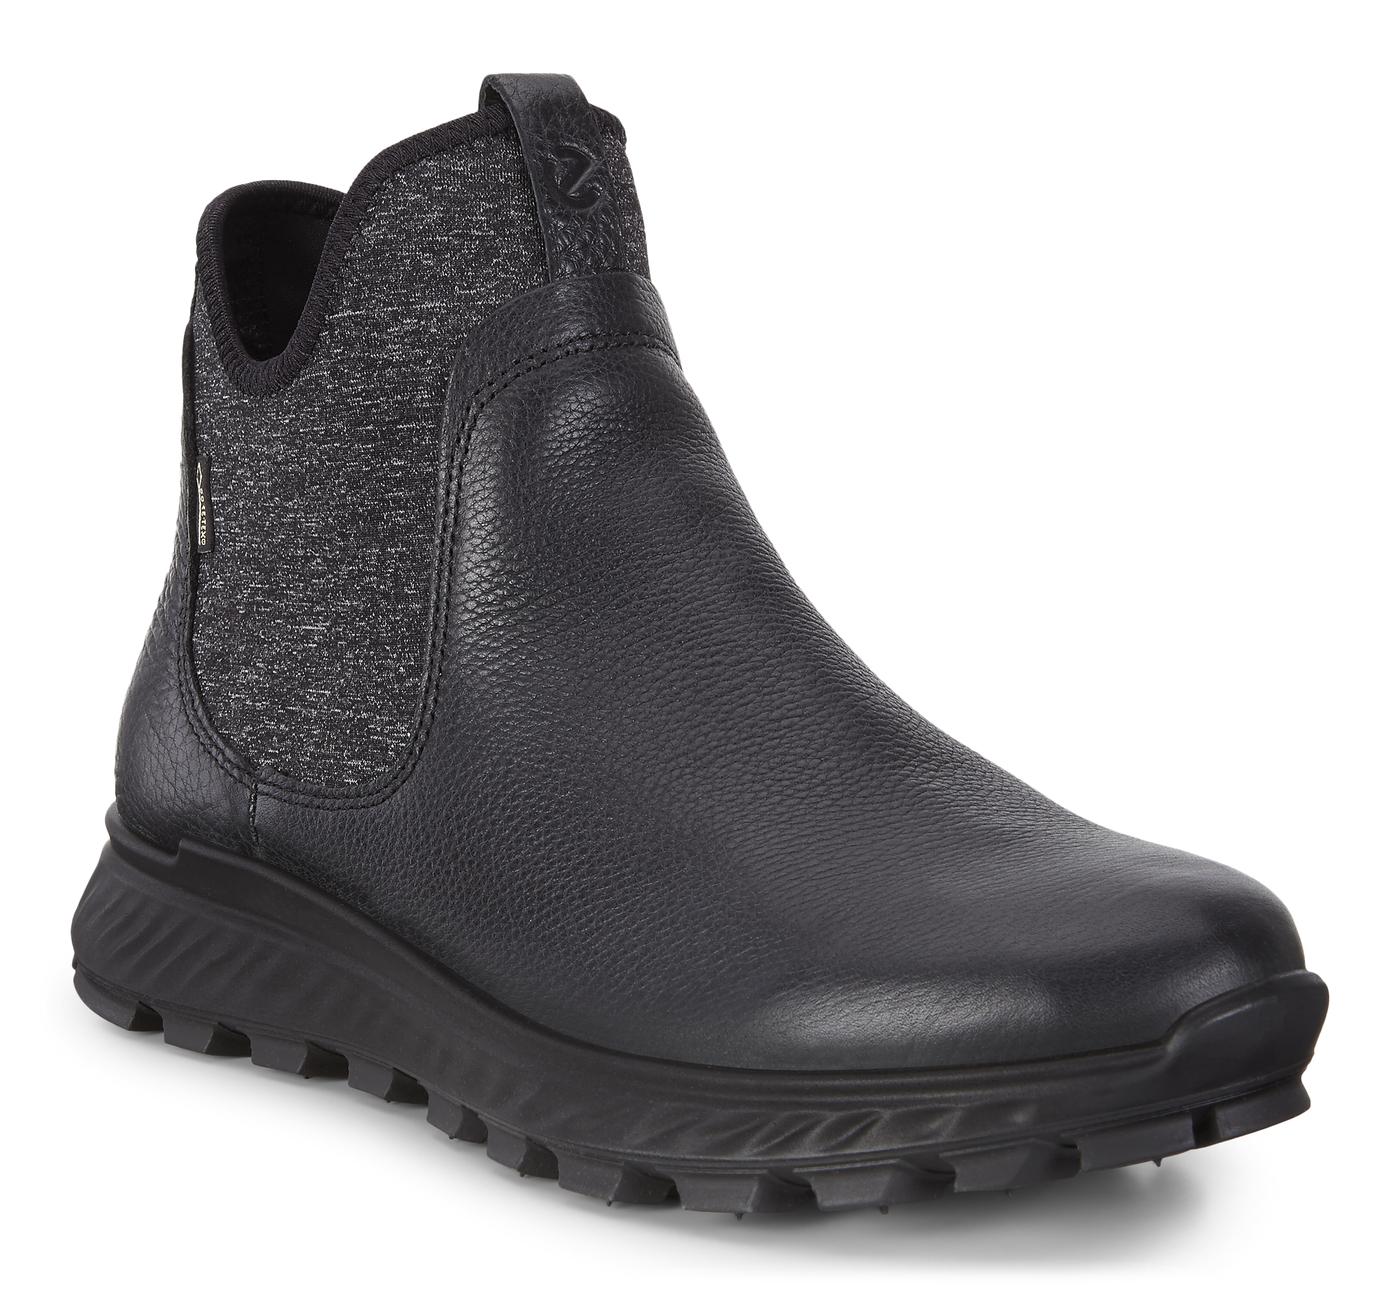 91e75e75166 ECCO EXOSTRIKE Hiking Ankle Chelsea Boot   Women's Shoes   ECCO® Shoes